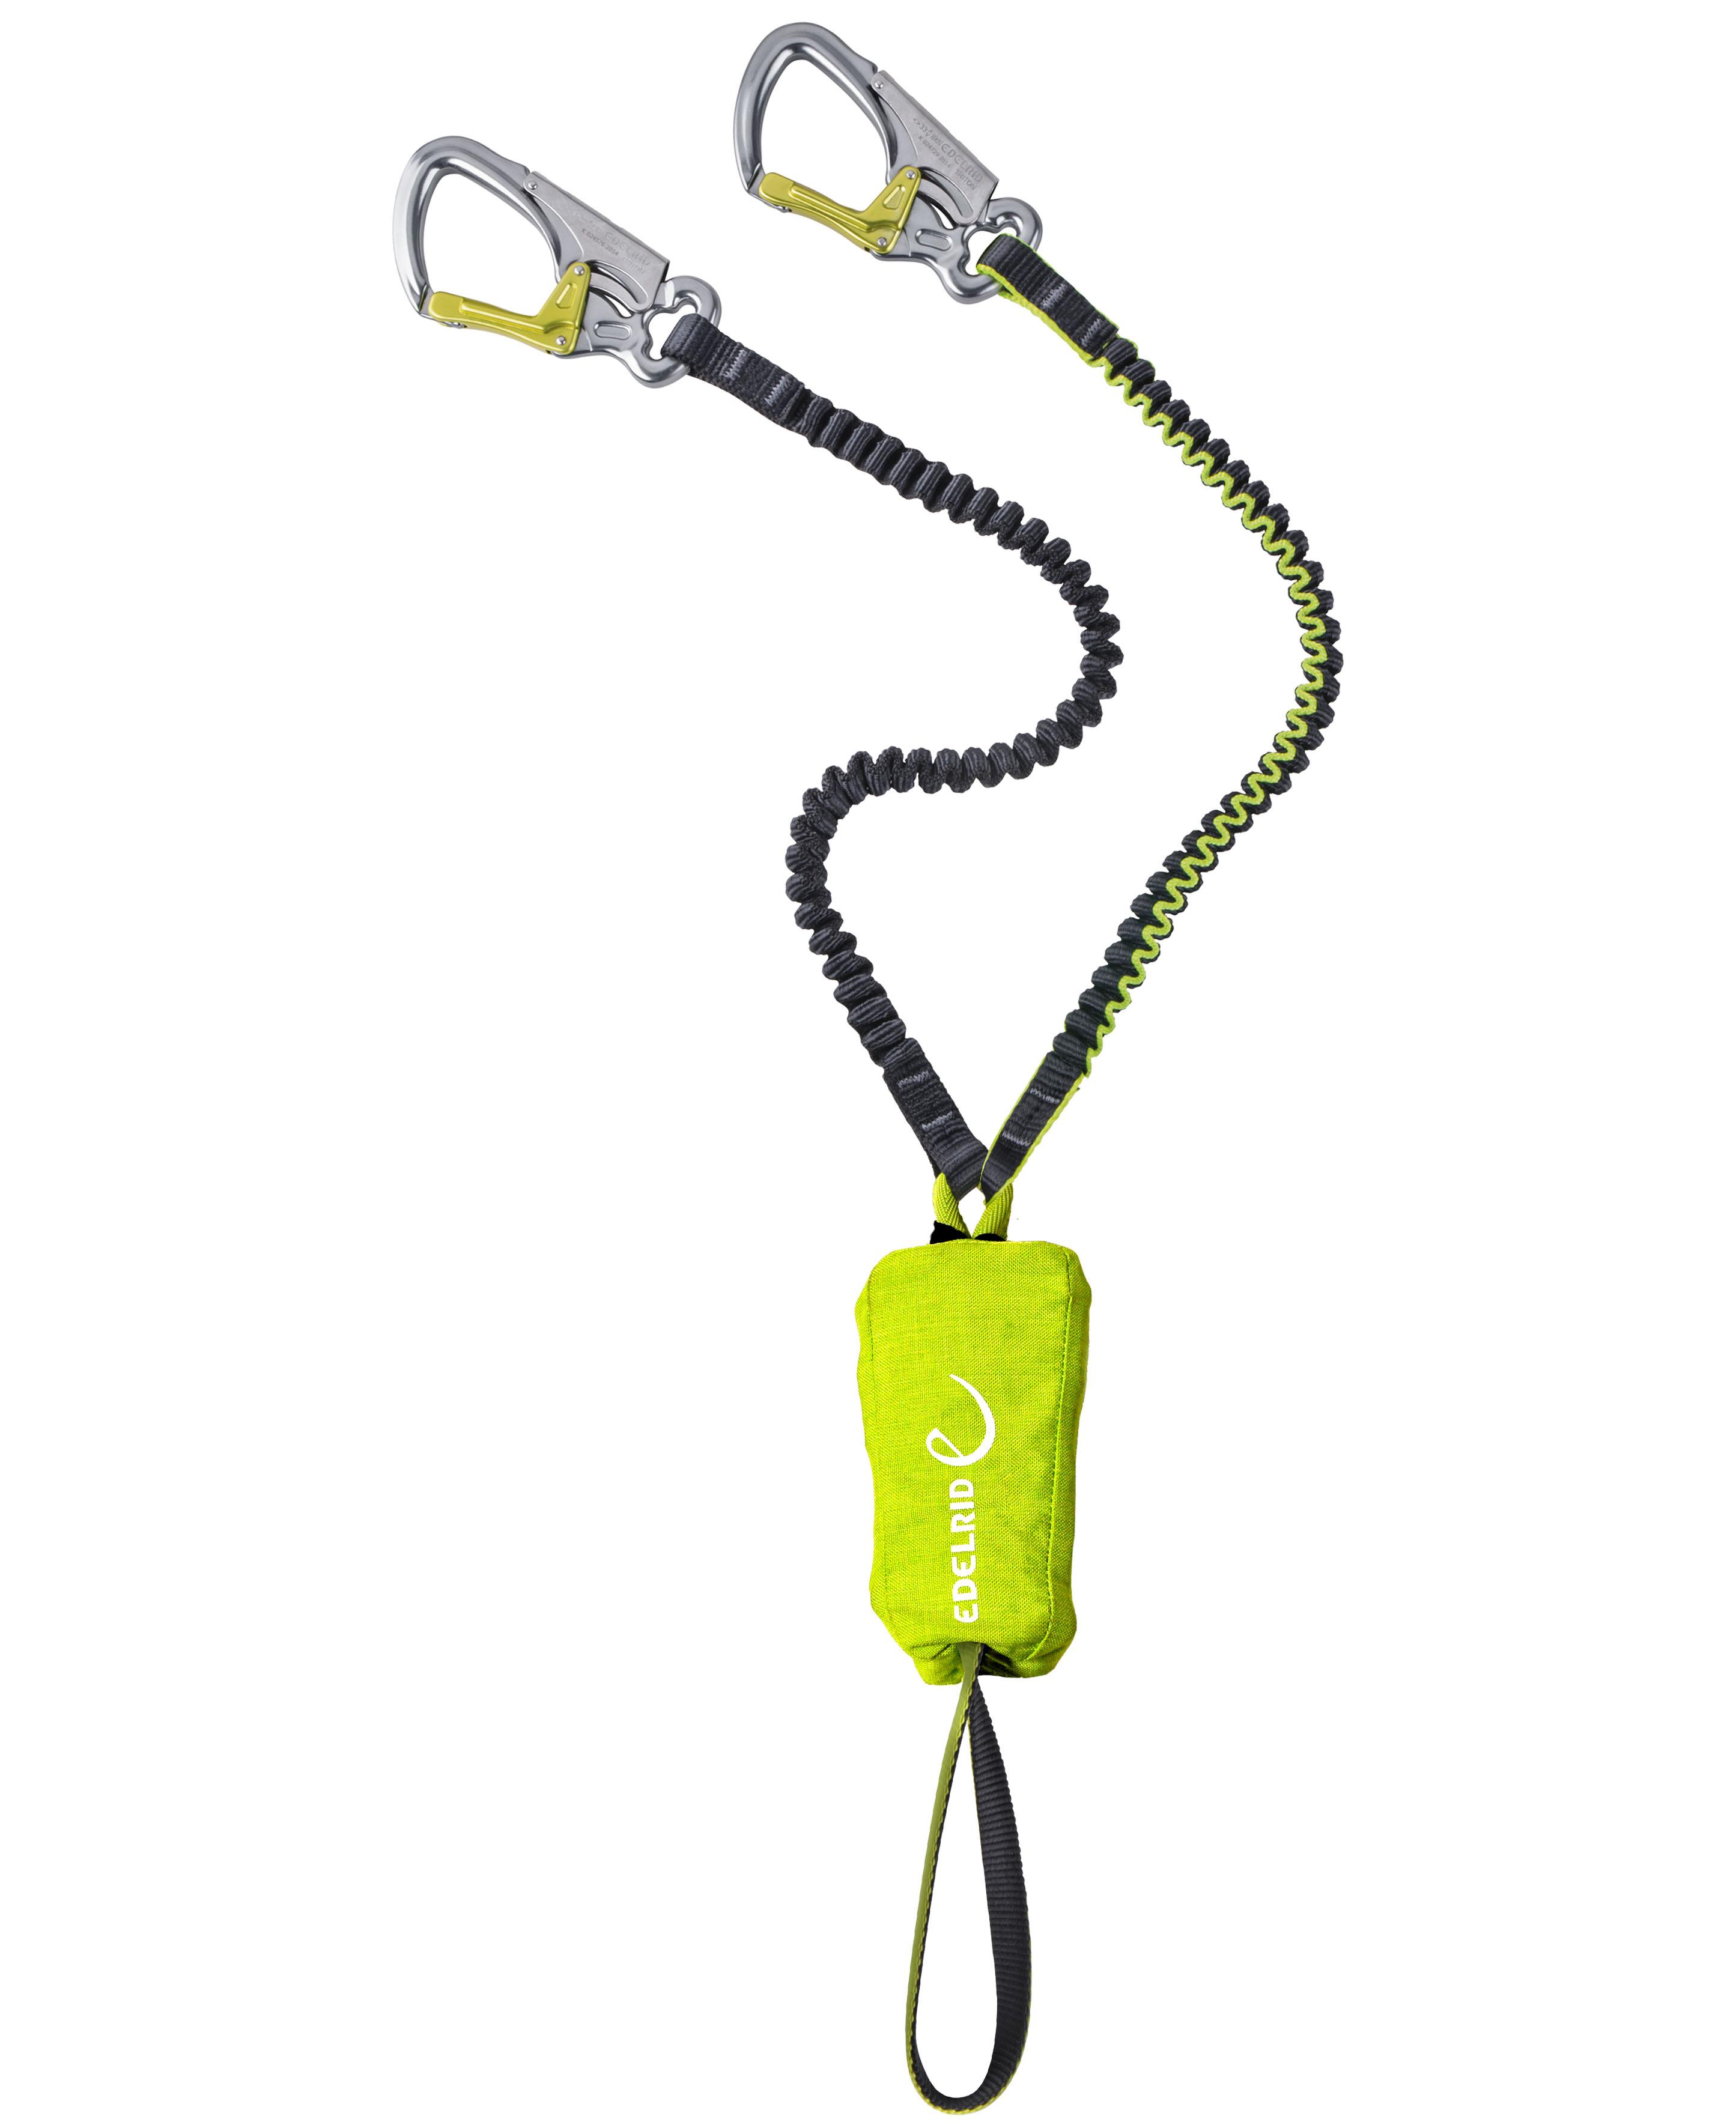 "Edelrid Klettersteigset ""Cable Kit Lite 5.0"""